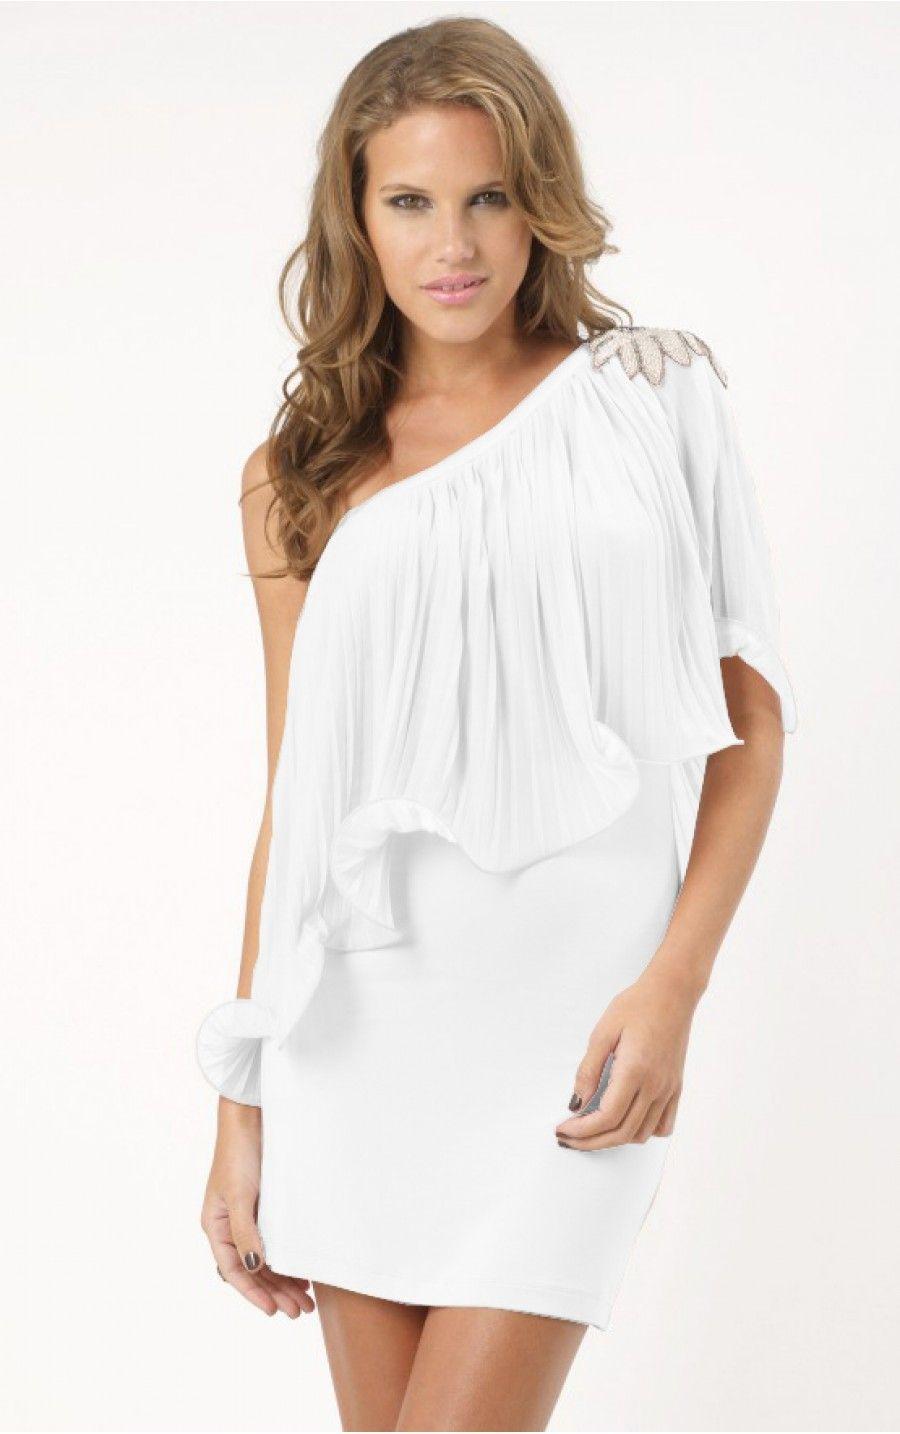 17 Best images about Semi Formal Dress on Pinterest - Short semi ...